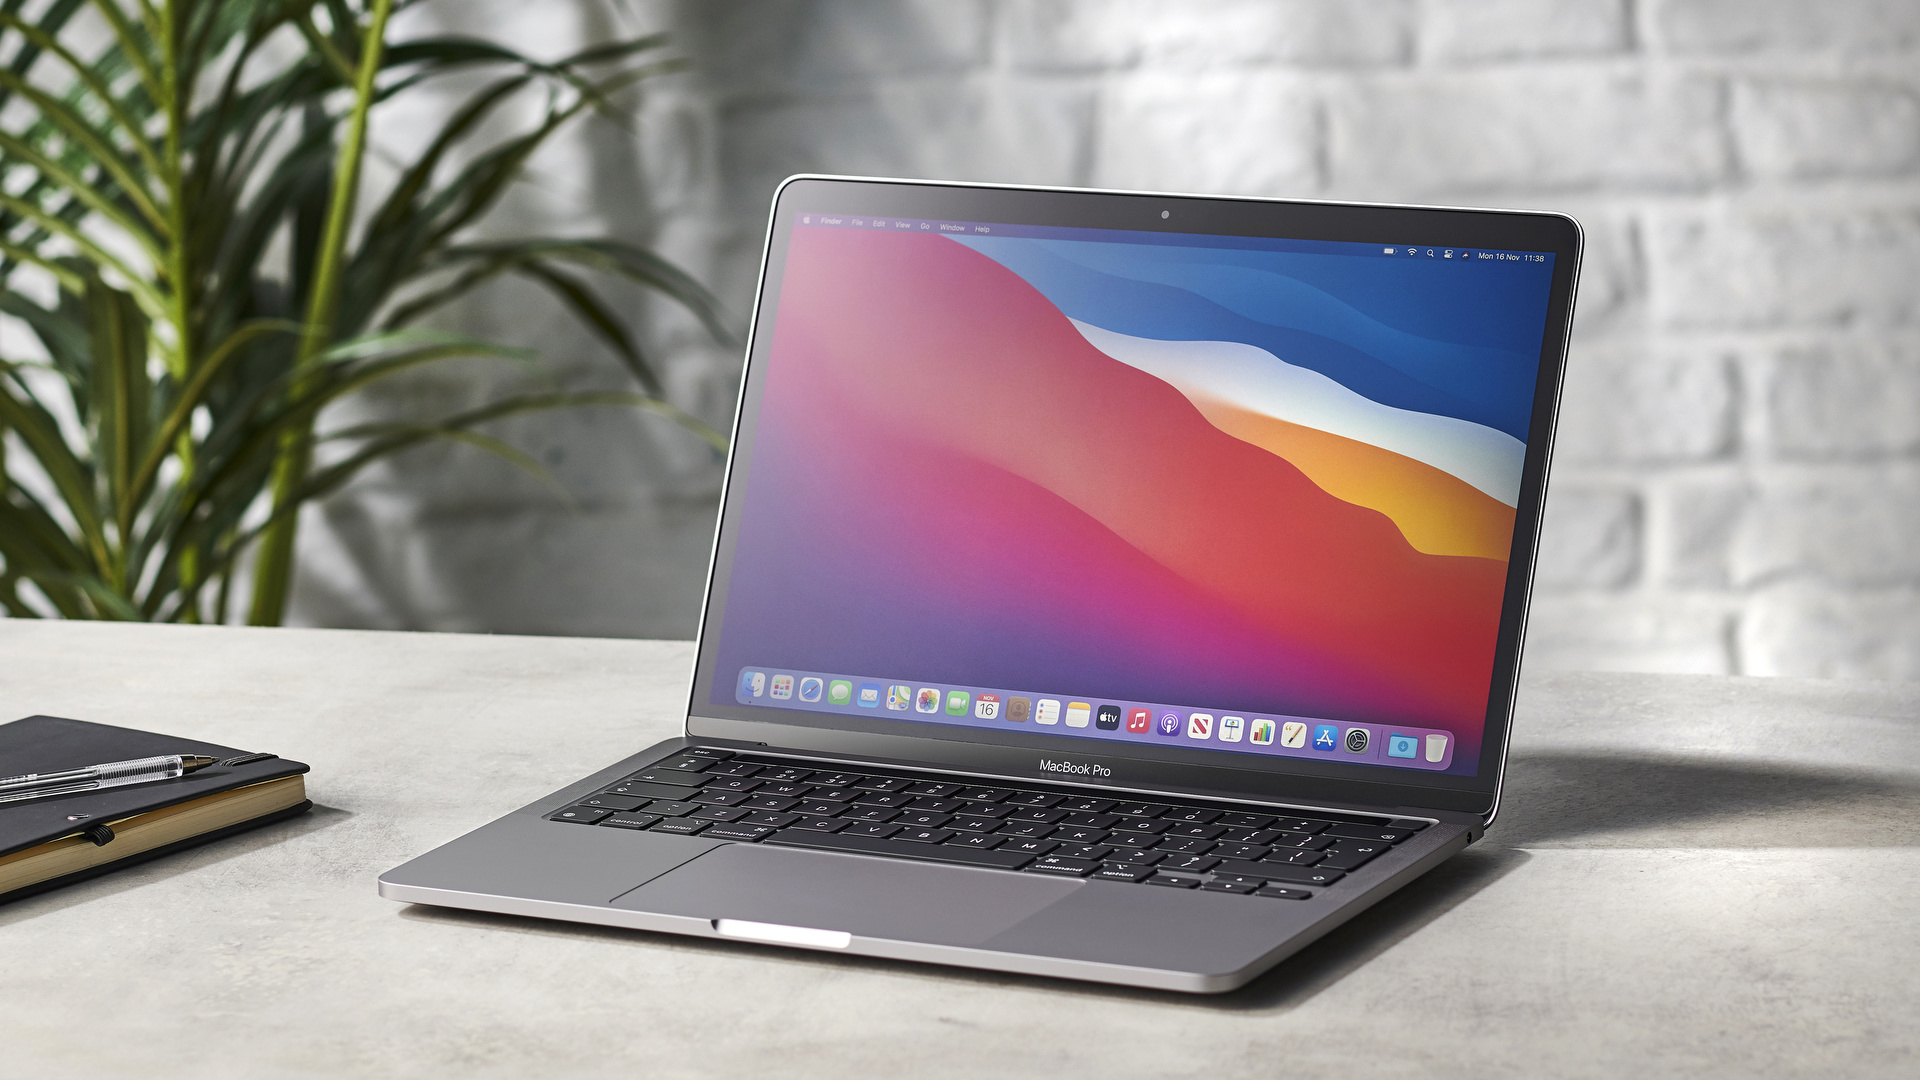 Apple MacBook Pro 13″ M1 best MacBook for most people